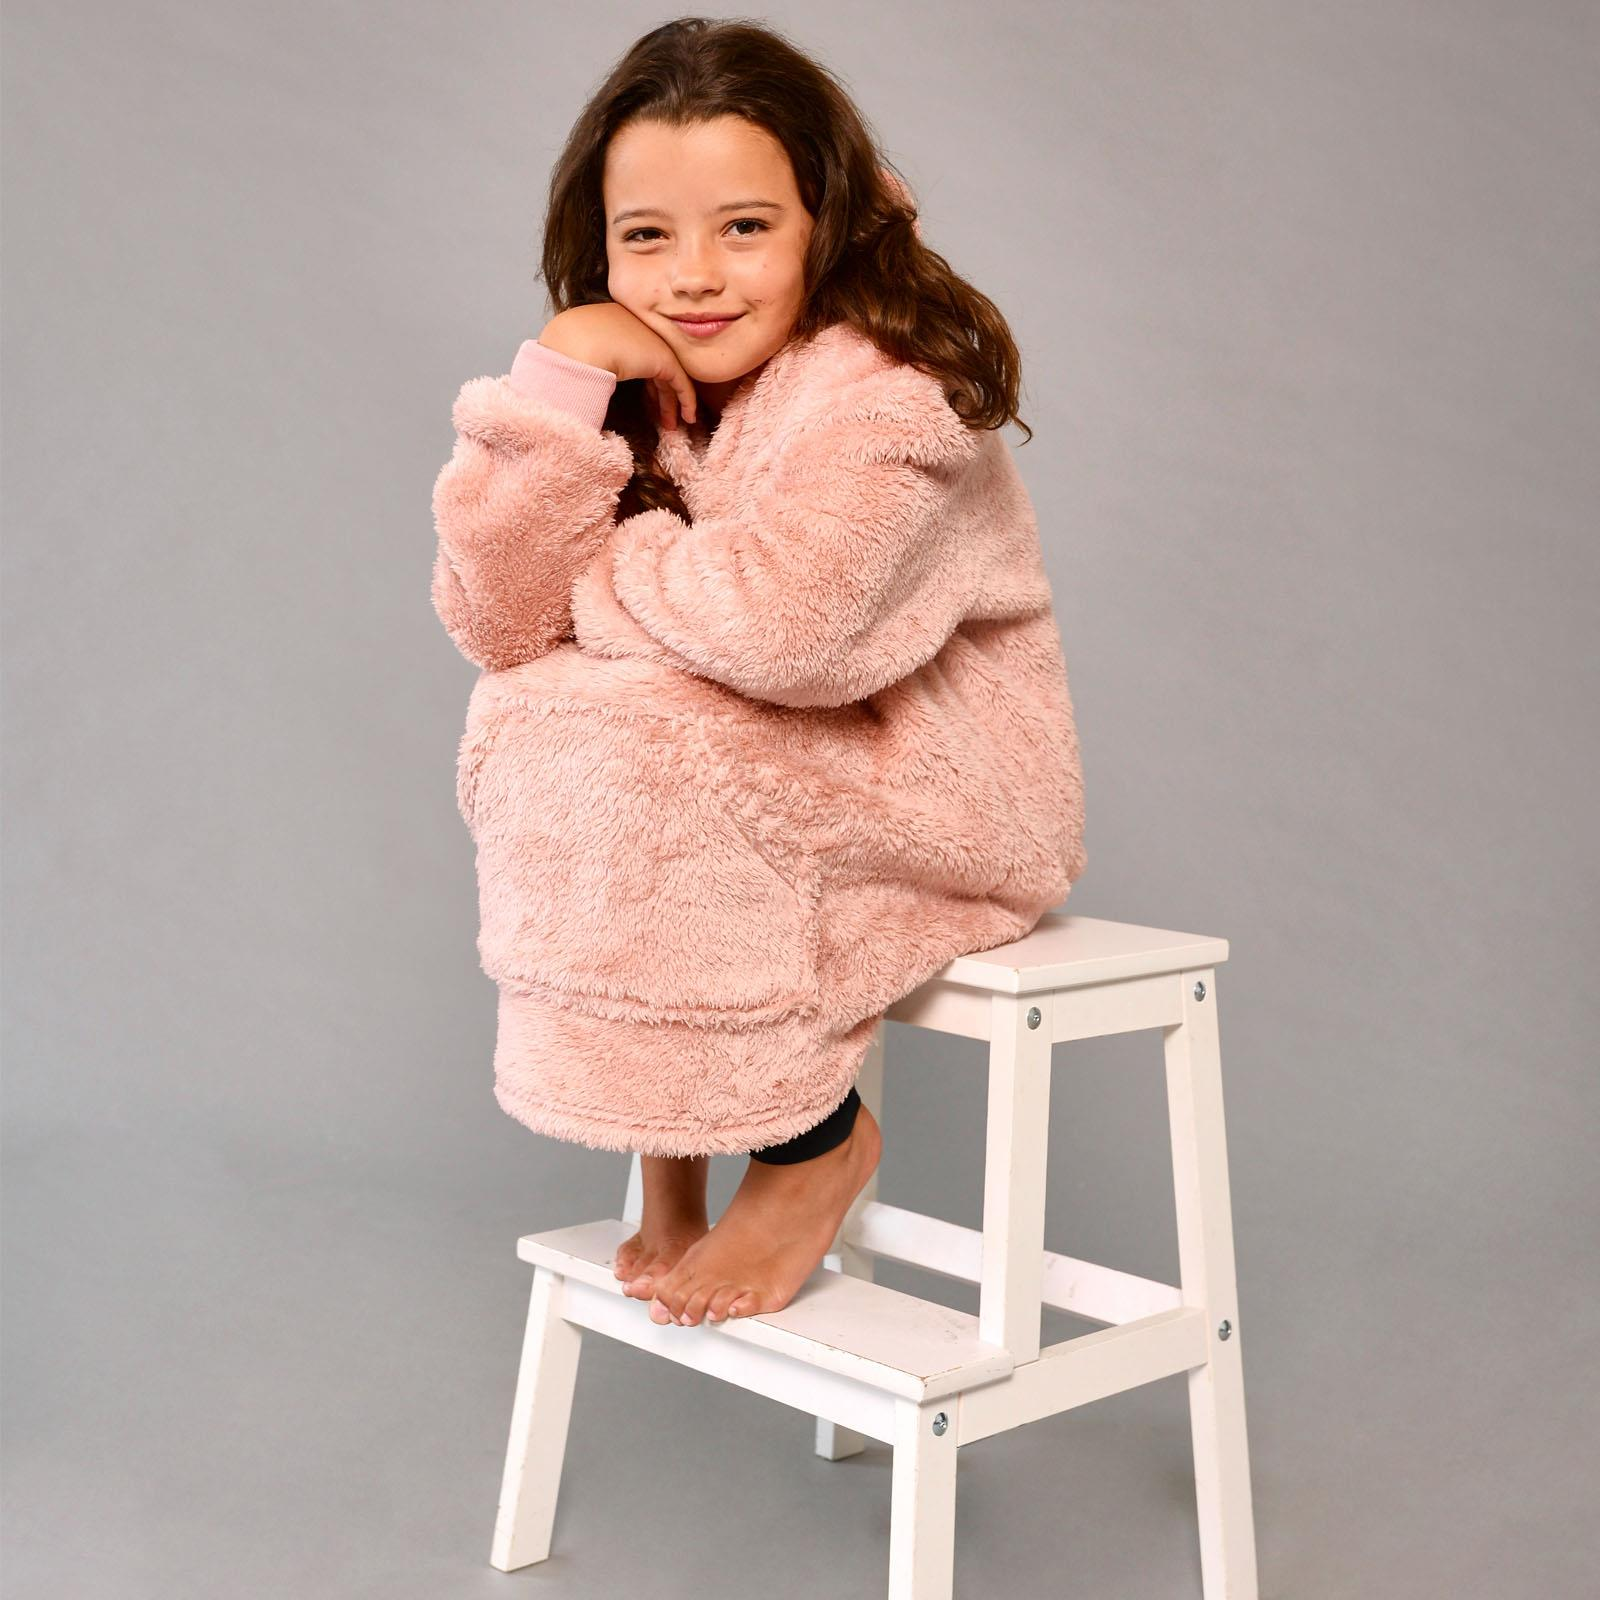 thumbnail 10 - Brentfords-Teddy-Fleece-Hoodie-Blanket-Oversized-Giant-Wearable-Adults-Kids-UK